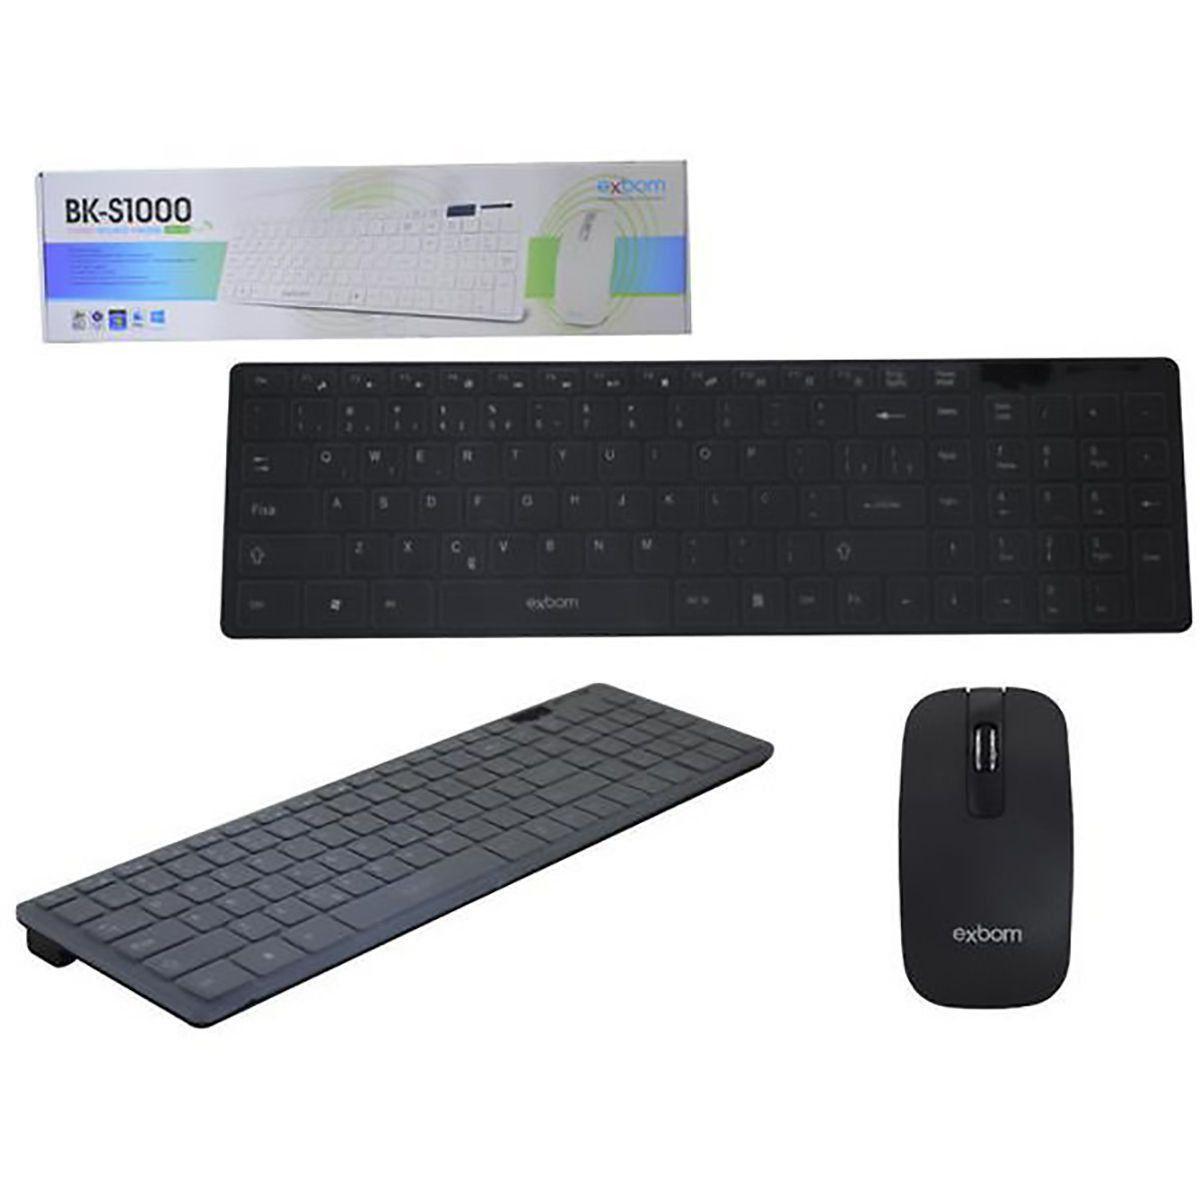 Kit Teclado + Mouse Wireless Sem Fio 2.4Ghz 1600 Dpi Exbom BK-S1000 Preto